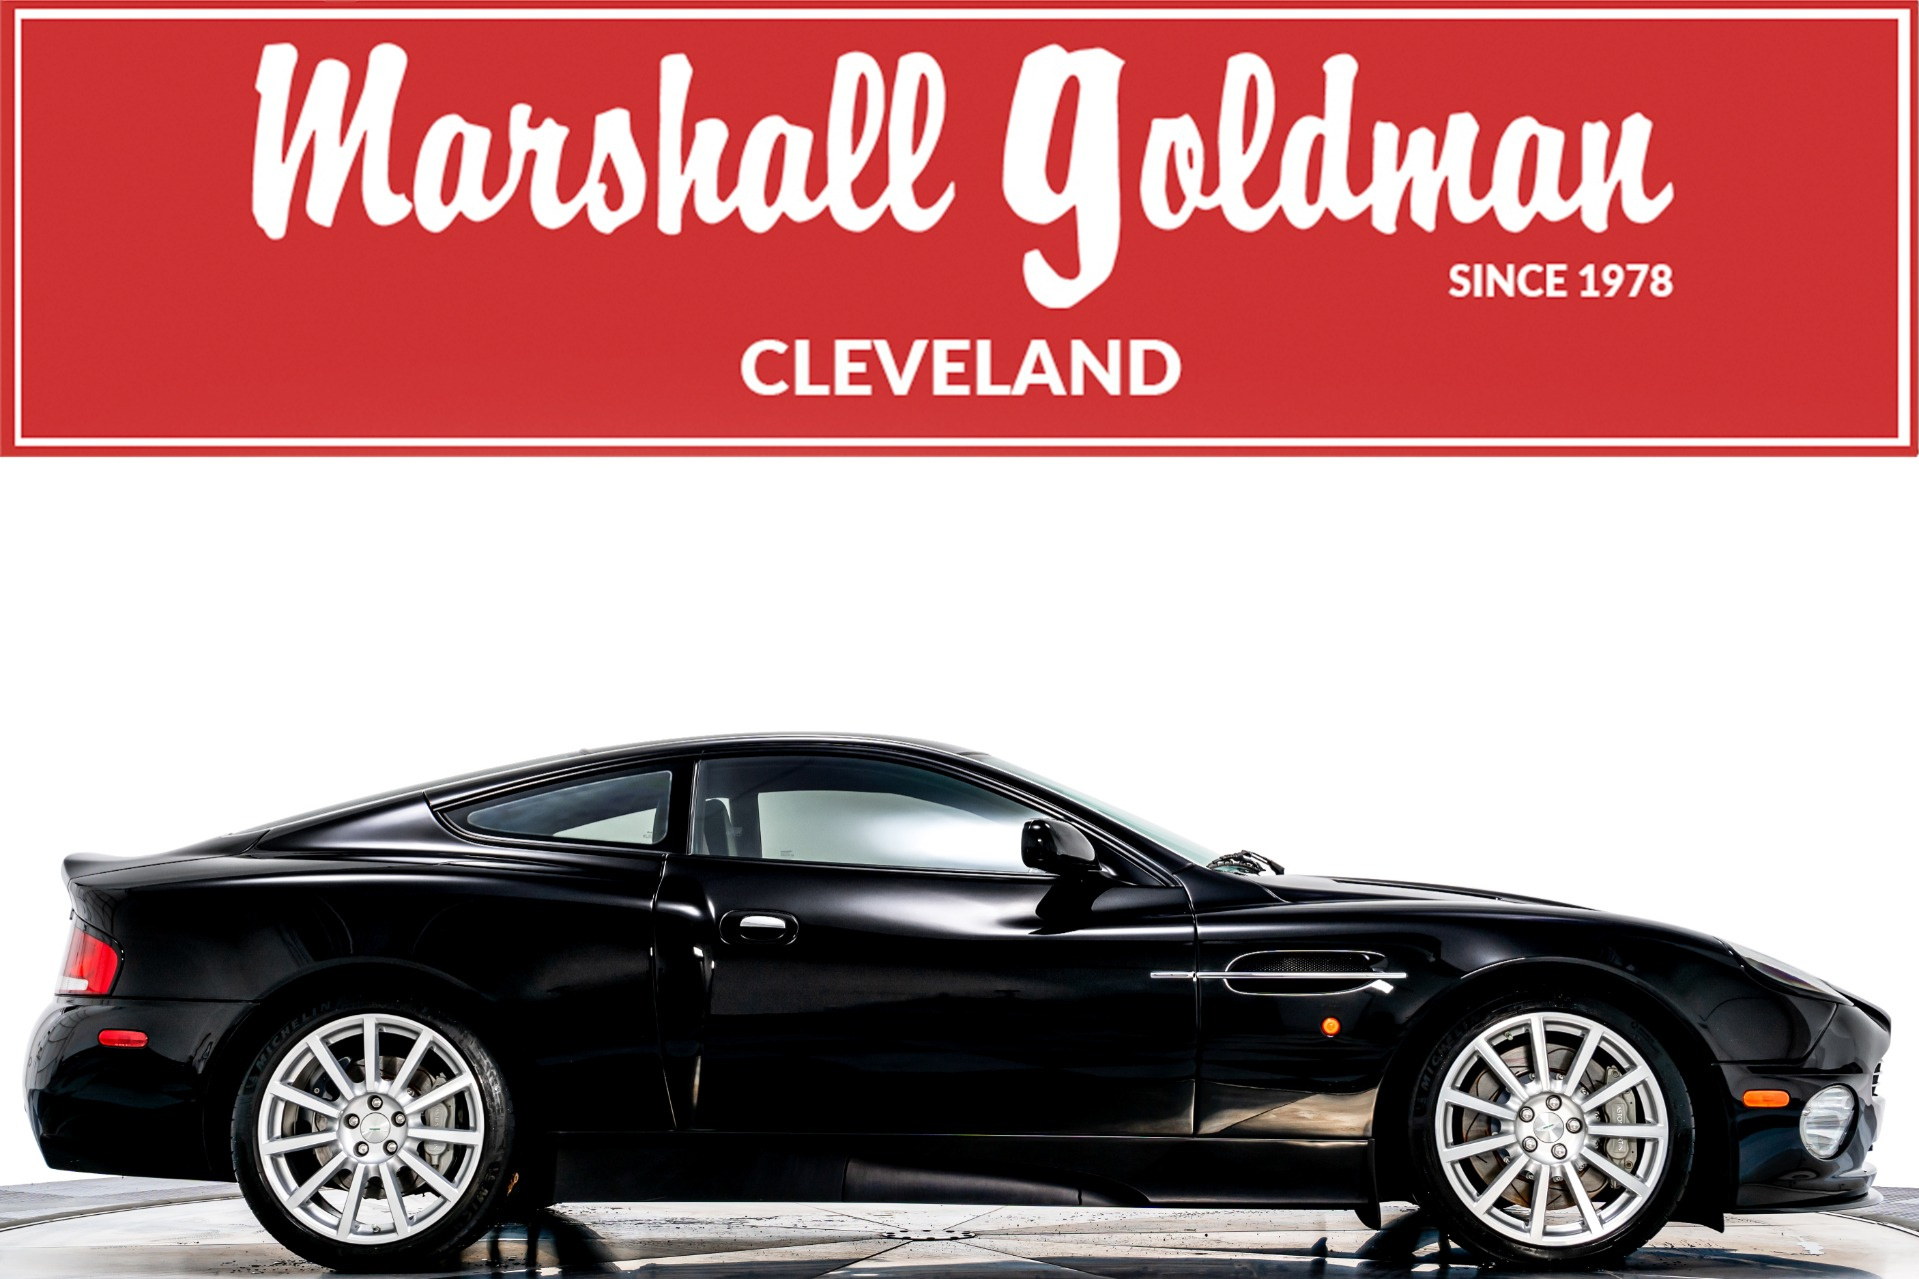 Used 2005 Aston Martin Vanquish S For Sale Sold Marshall Goldman Motor Sales Stock W20478